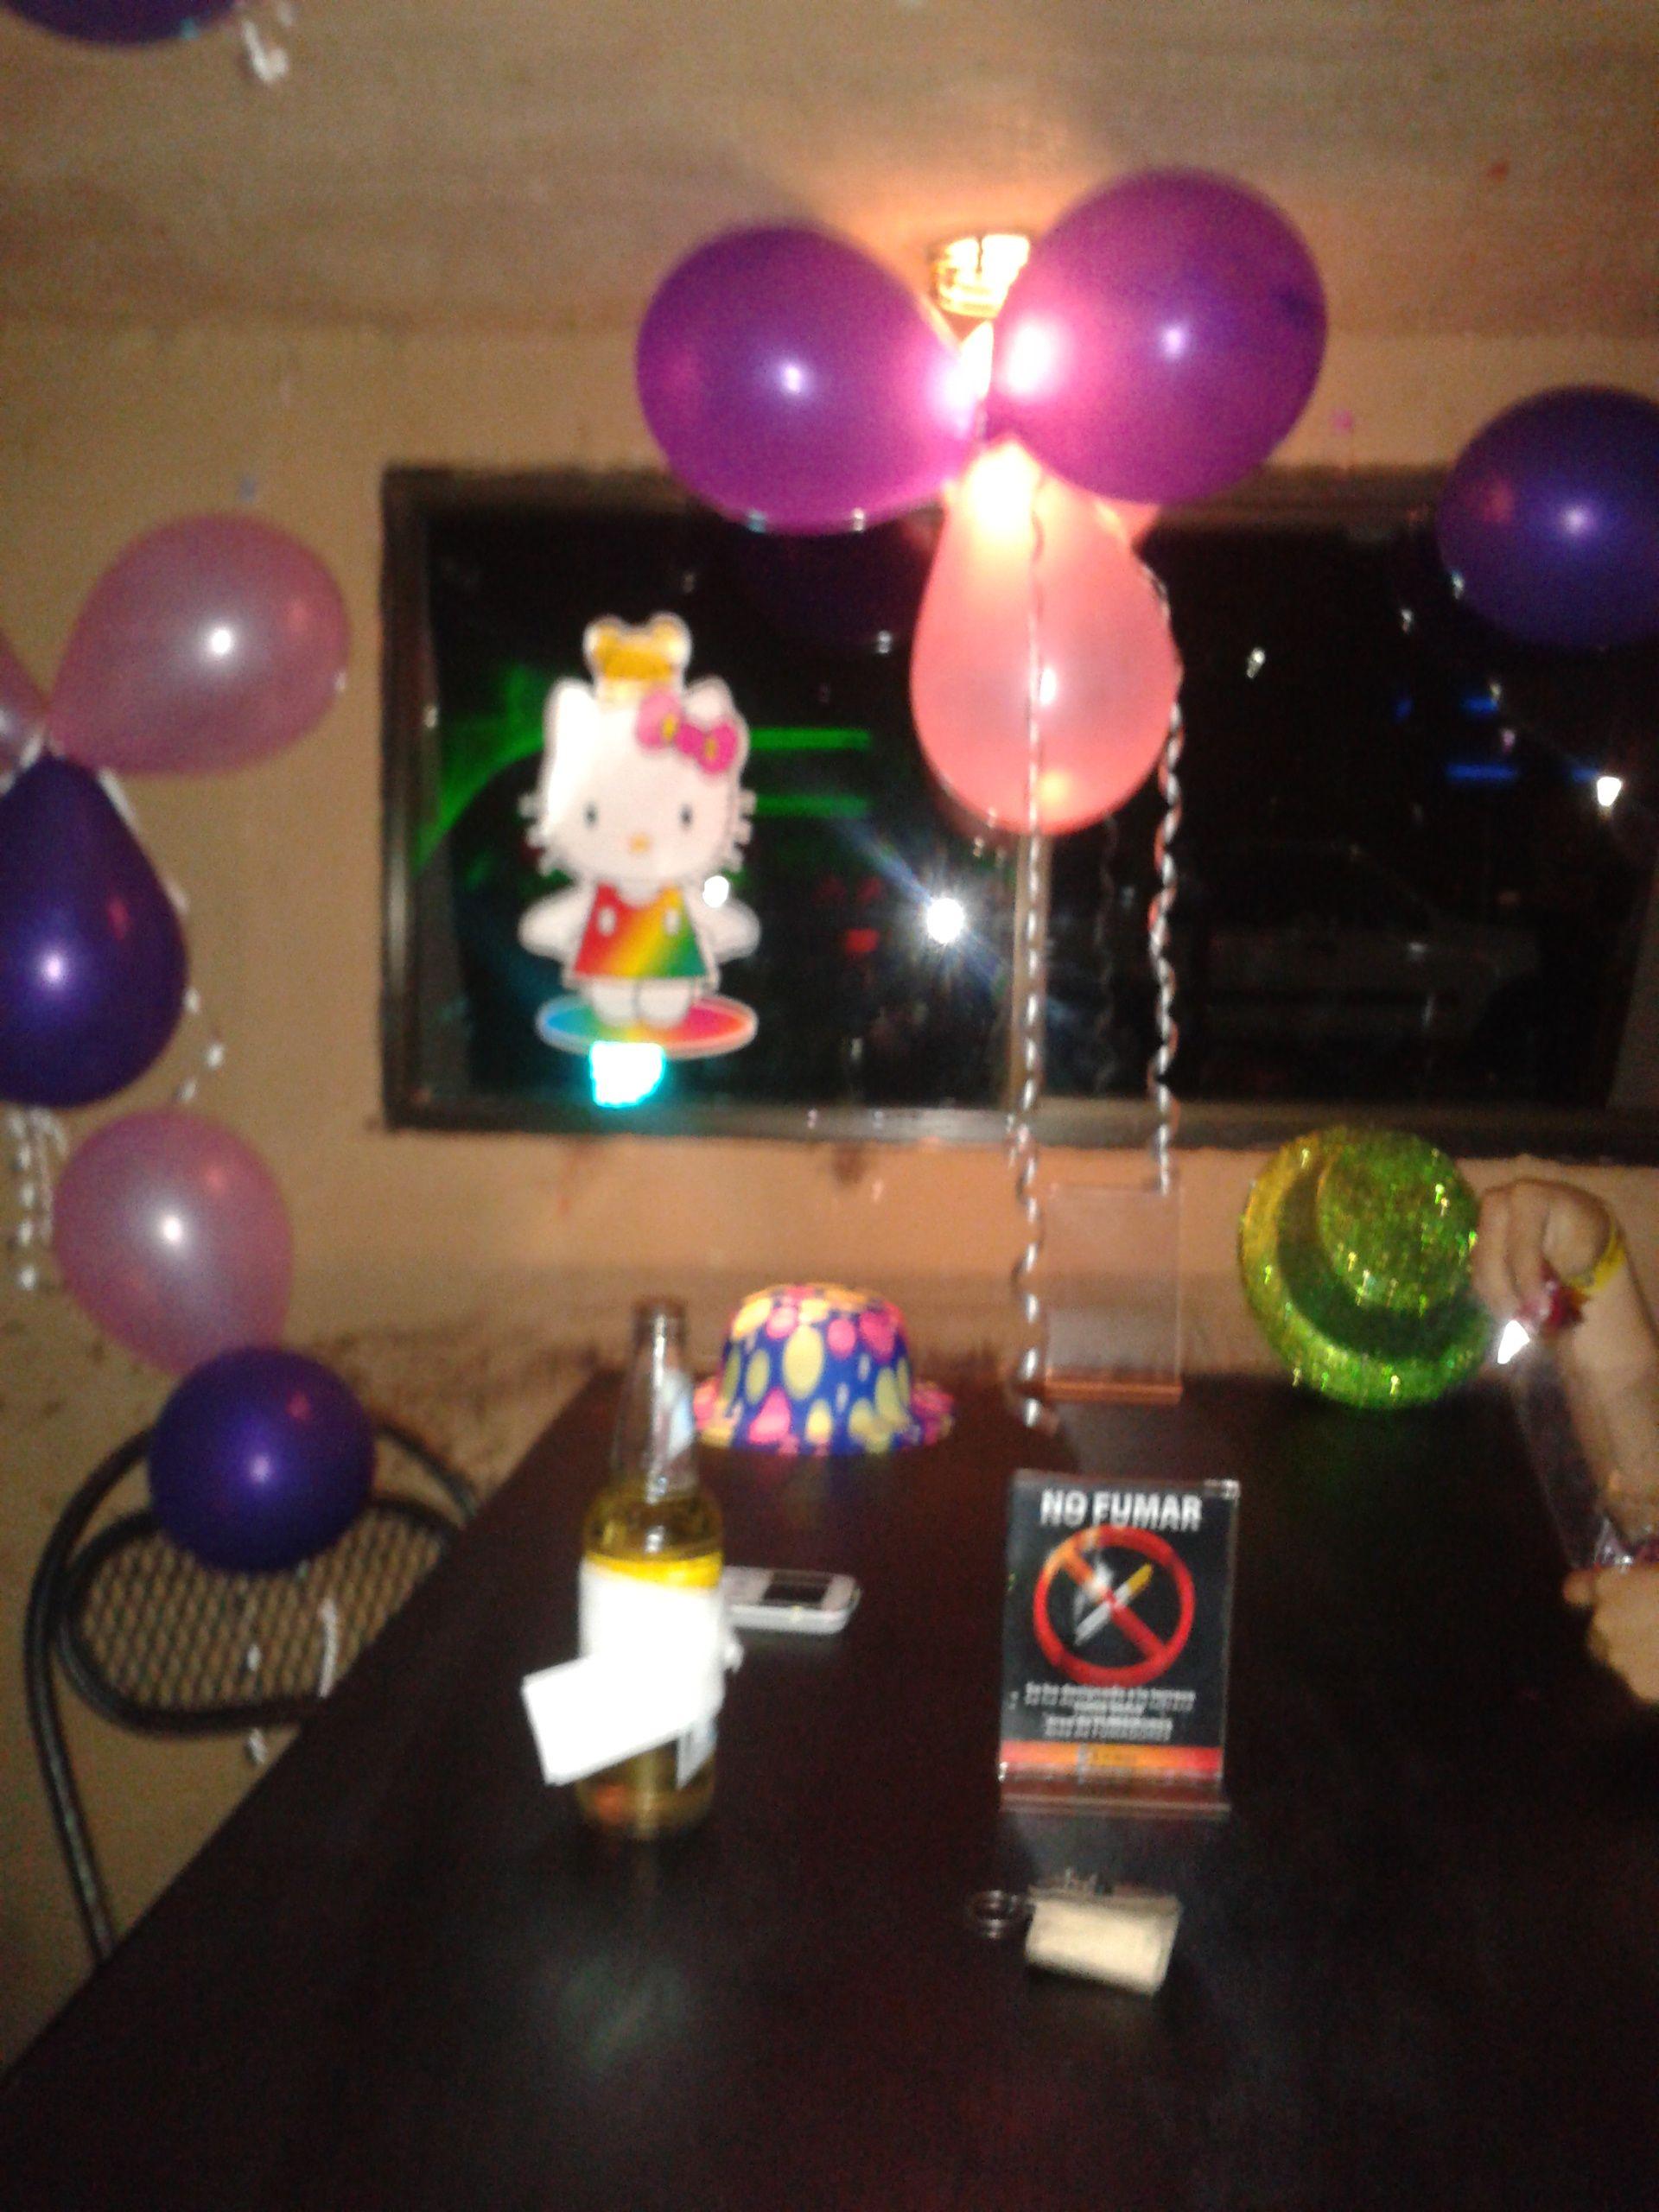 Decoracion de mesa en discoteca para cumple decoracion para fiestas tematicas pinterest - Ideas para discotecas ...